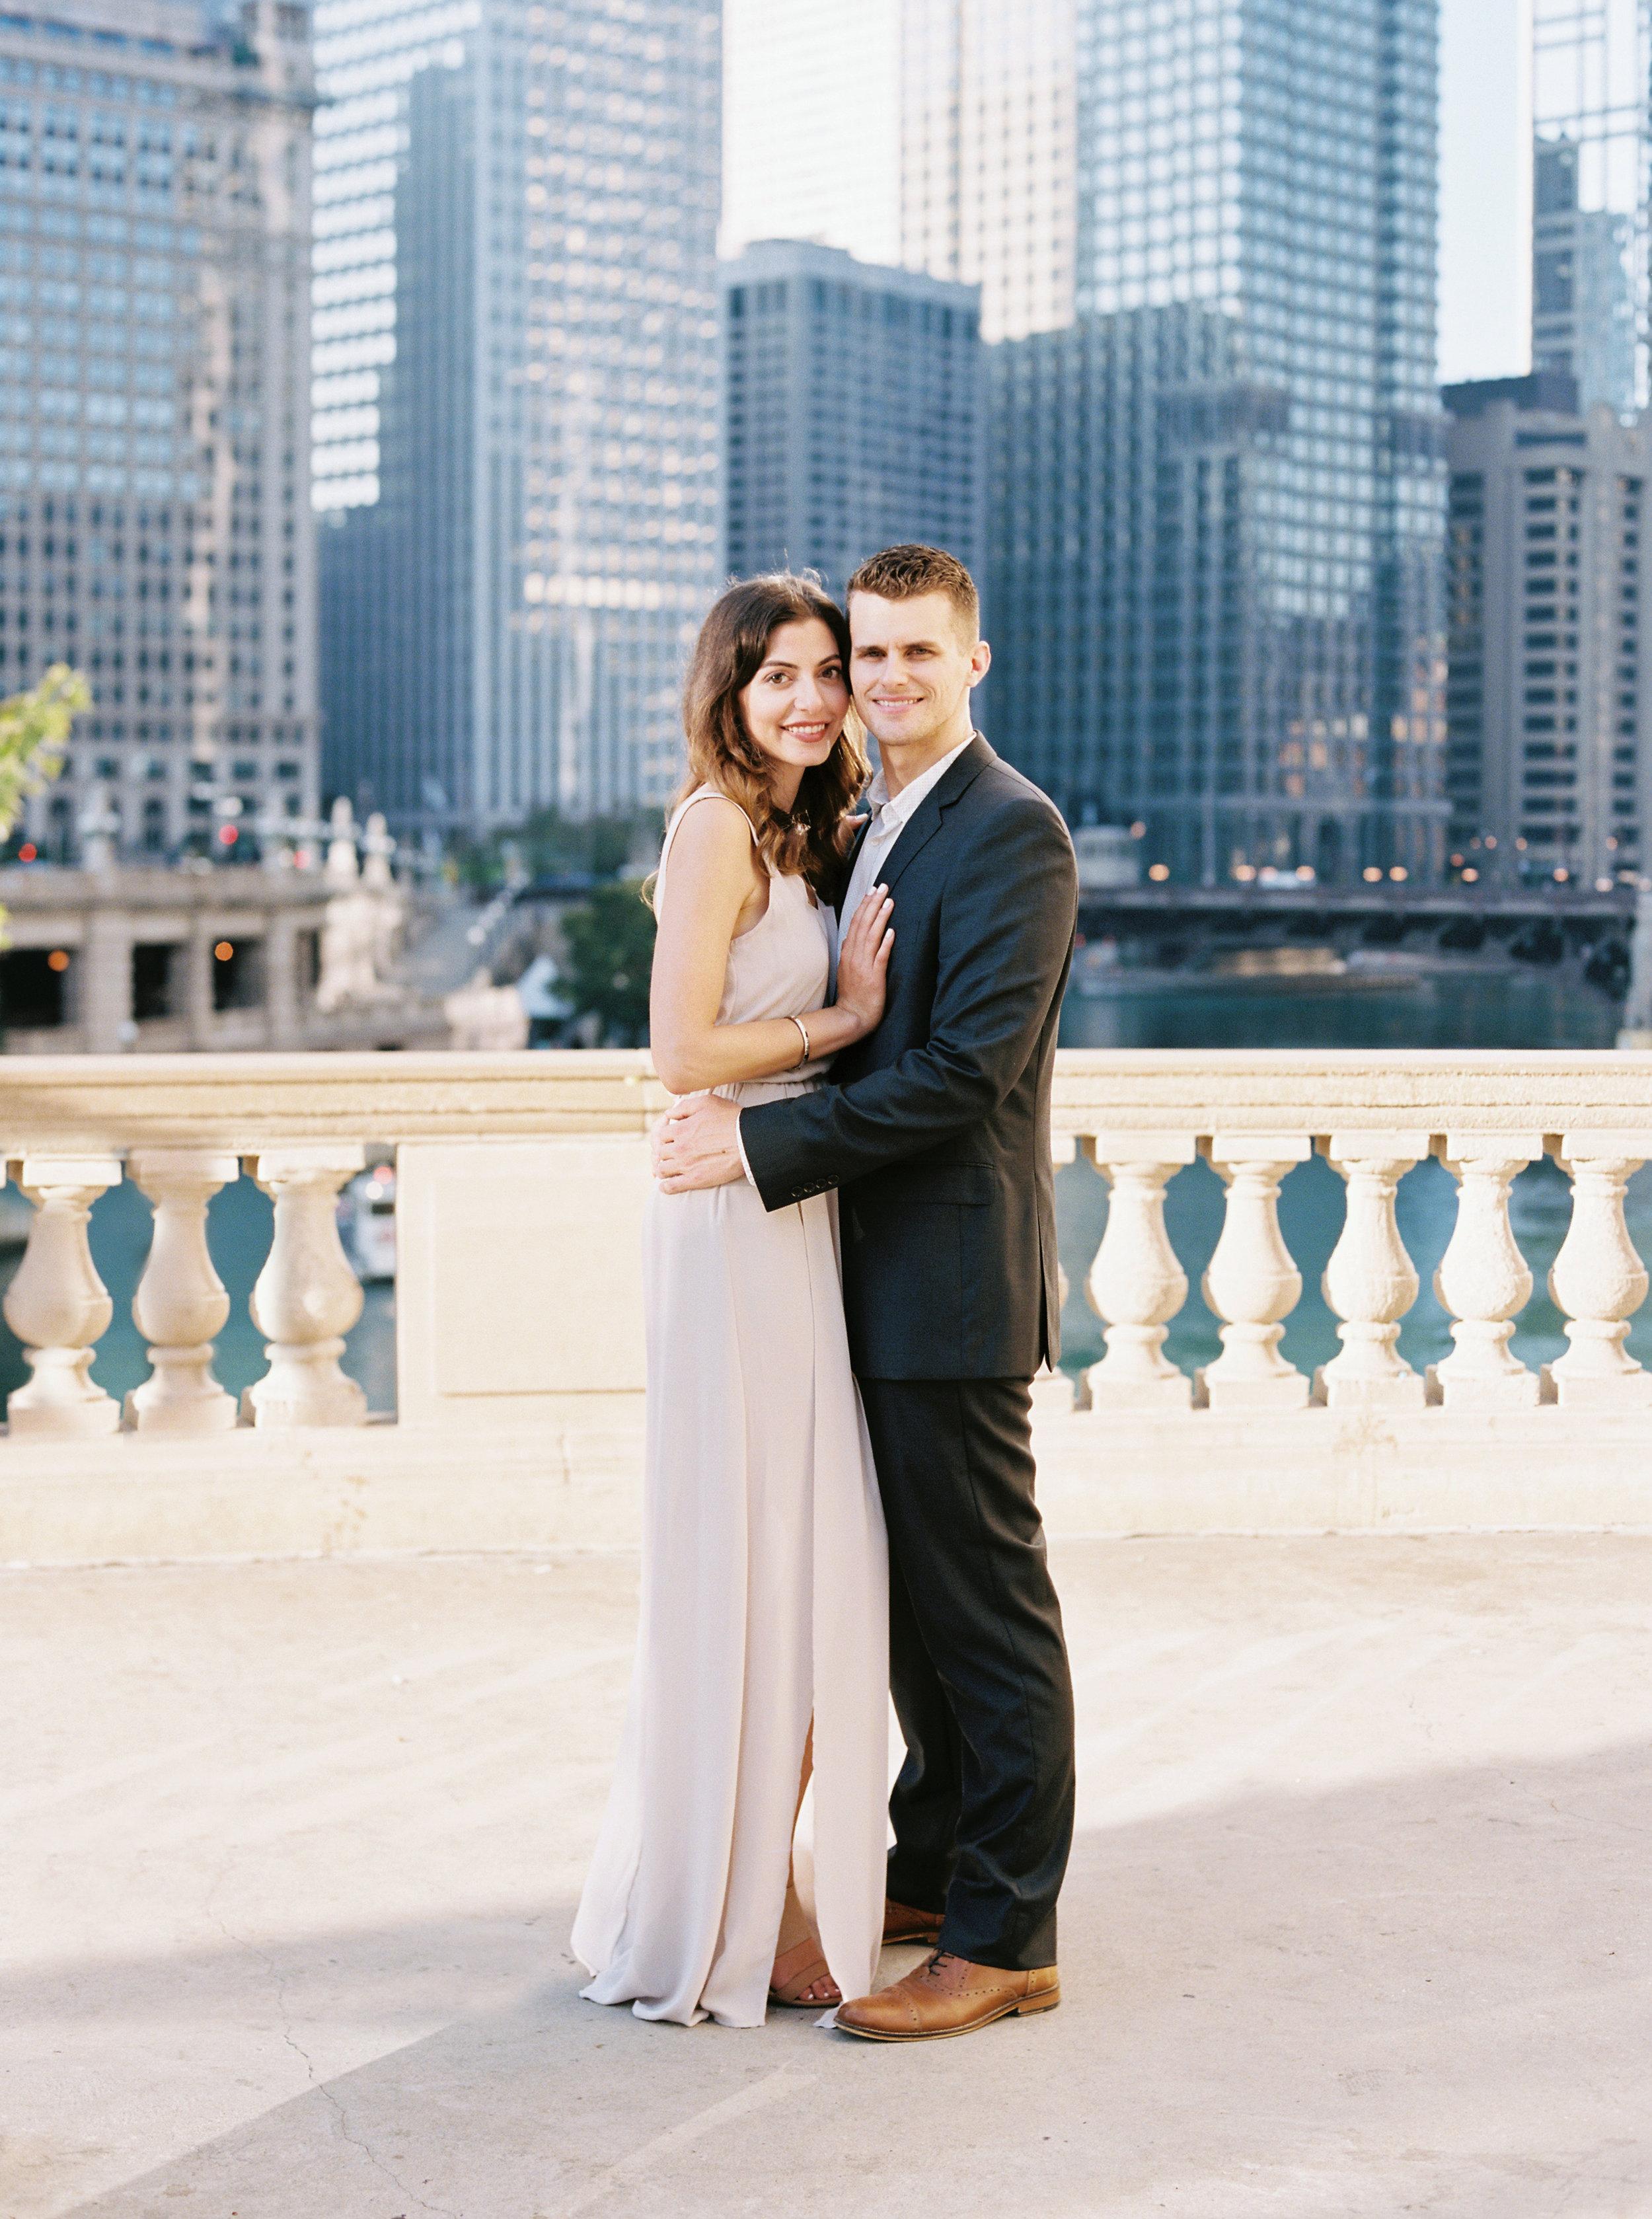 Kyle John l Fine Art Wedding Photography l Chicago, Copenhagen, California, New York, Destination l Blog l Nathalie and Colby_Lake Michigan_Sunrise Engagement_19